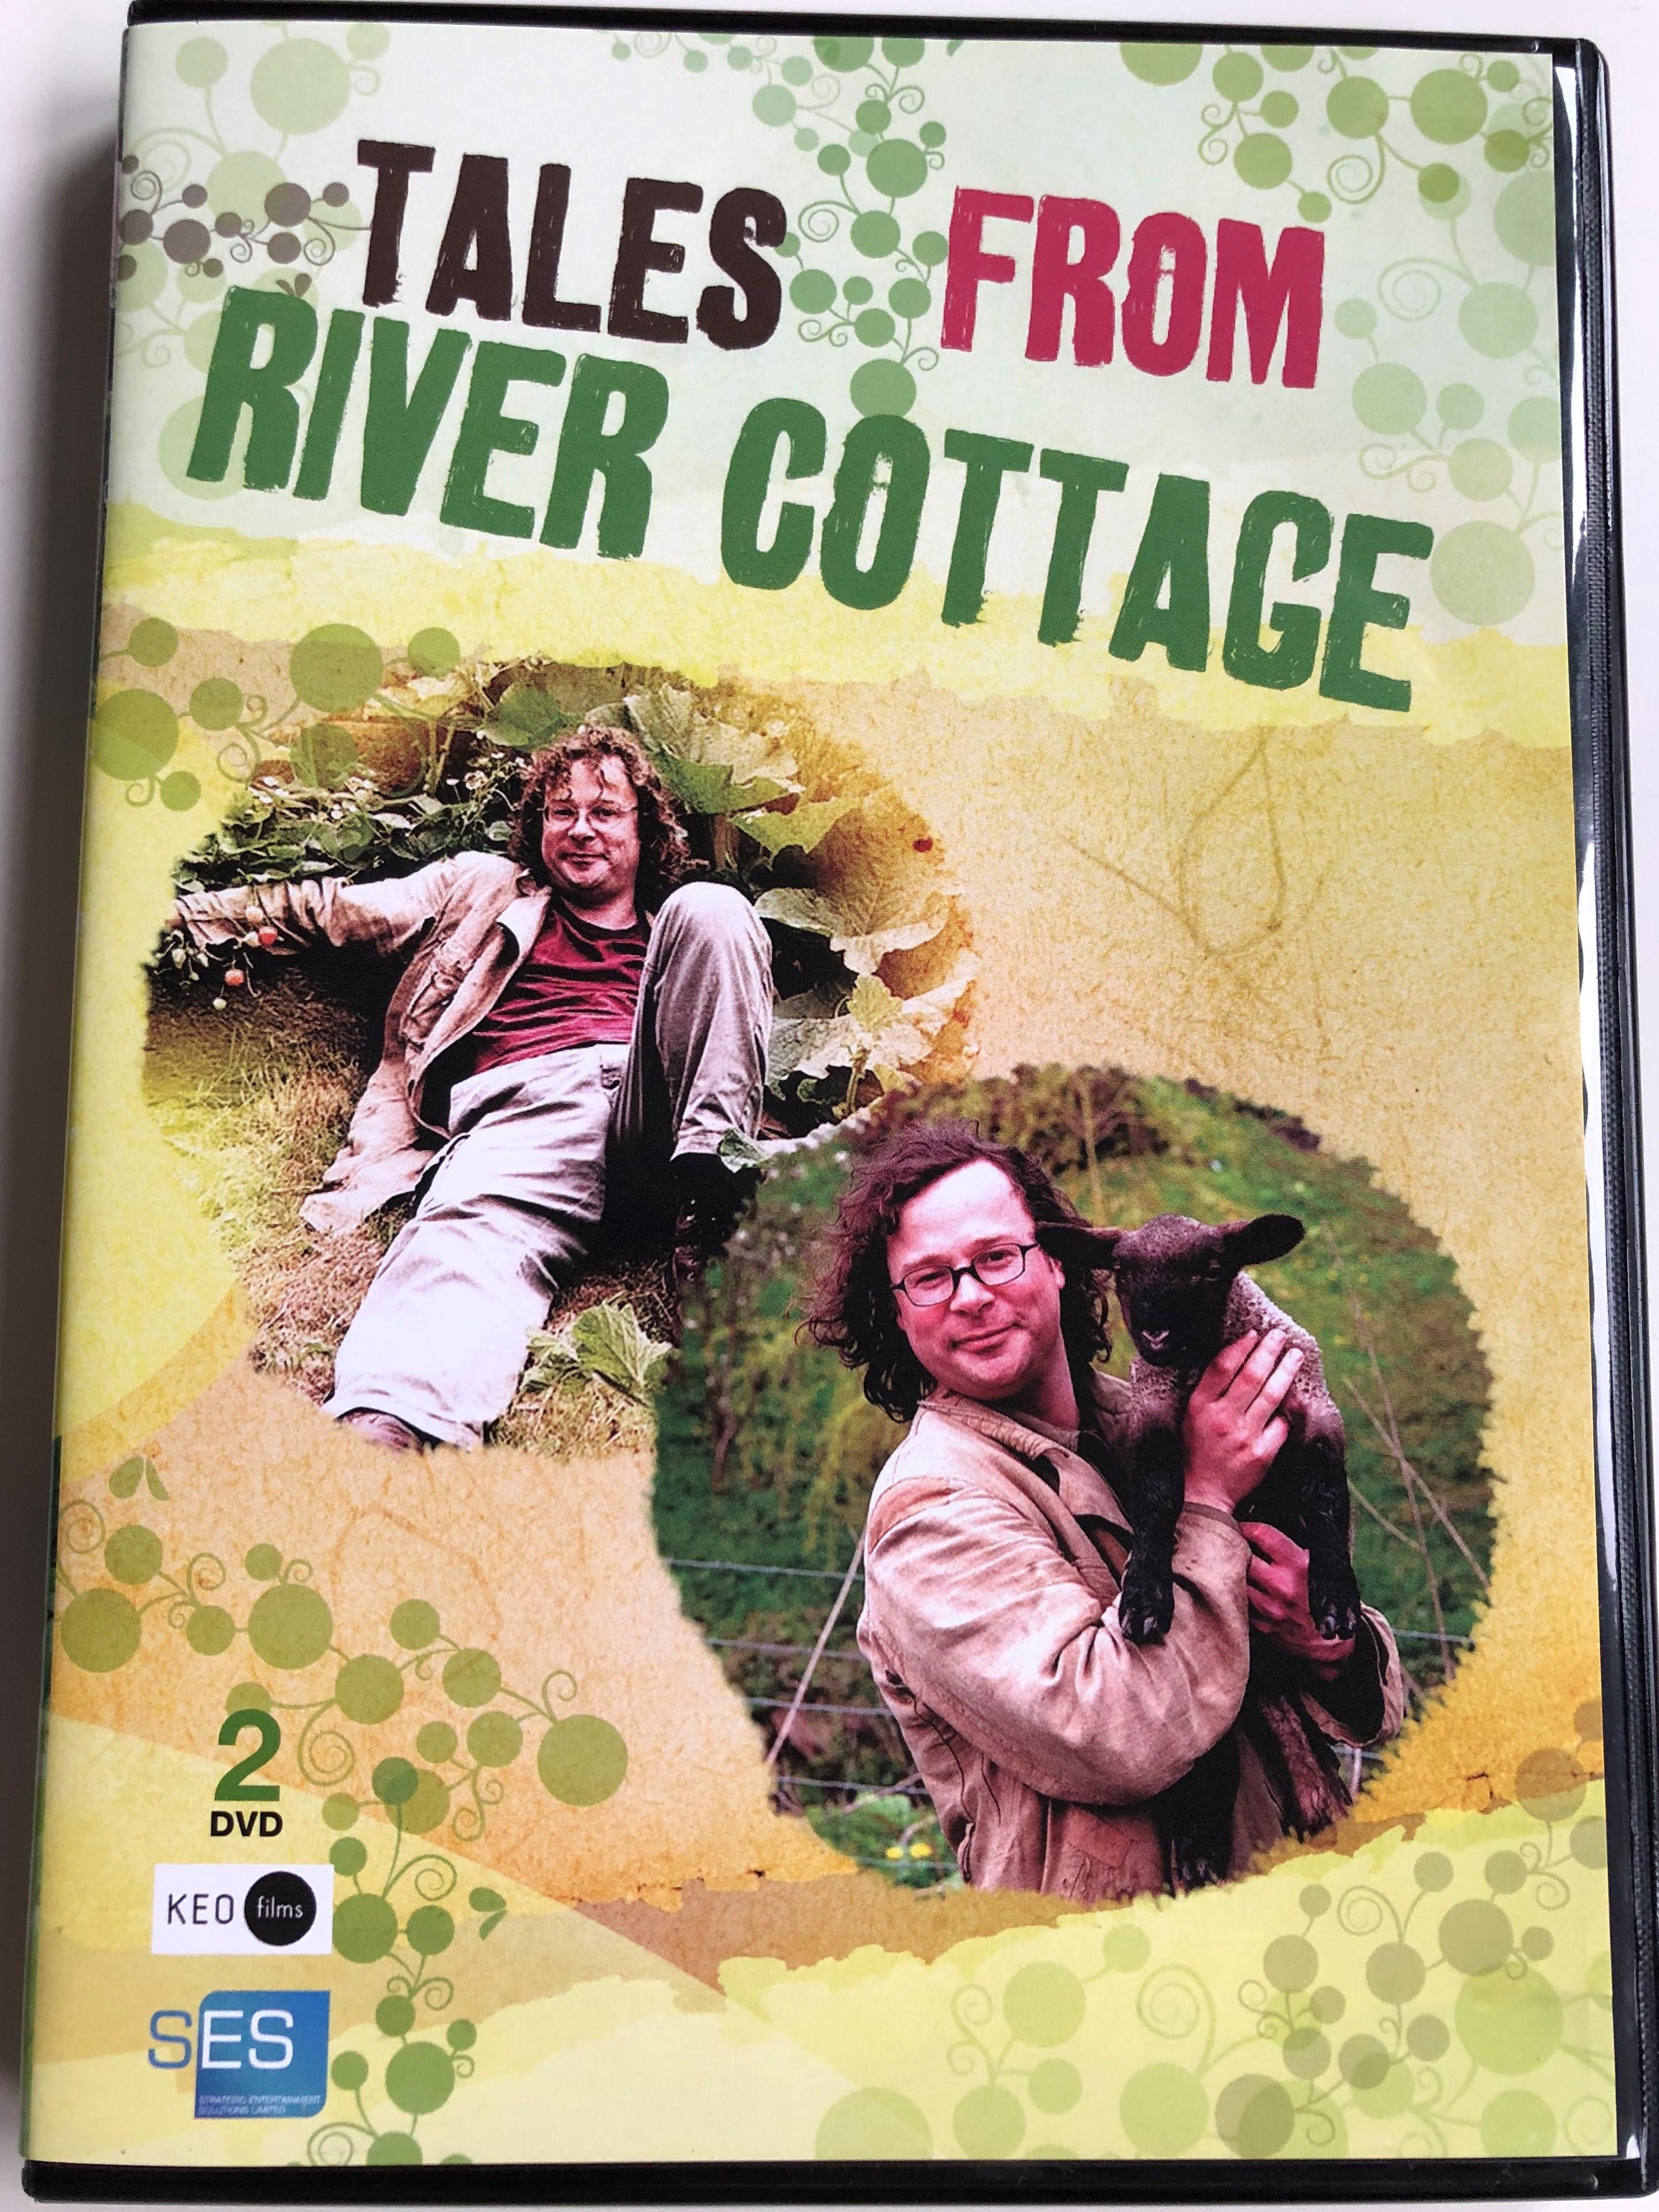 tales-from-river-cottage-dvd-2003-series-directors-zam-baring-garry-john-hughes-andrew-palmer-billy-paulett-1.jpg